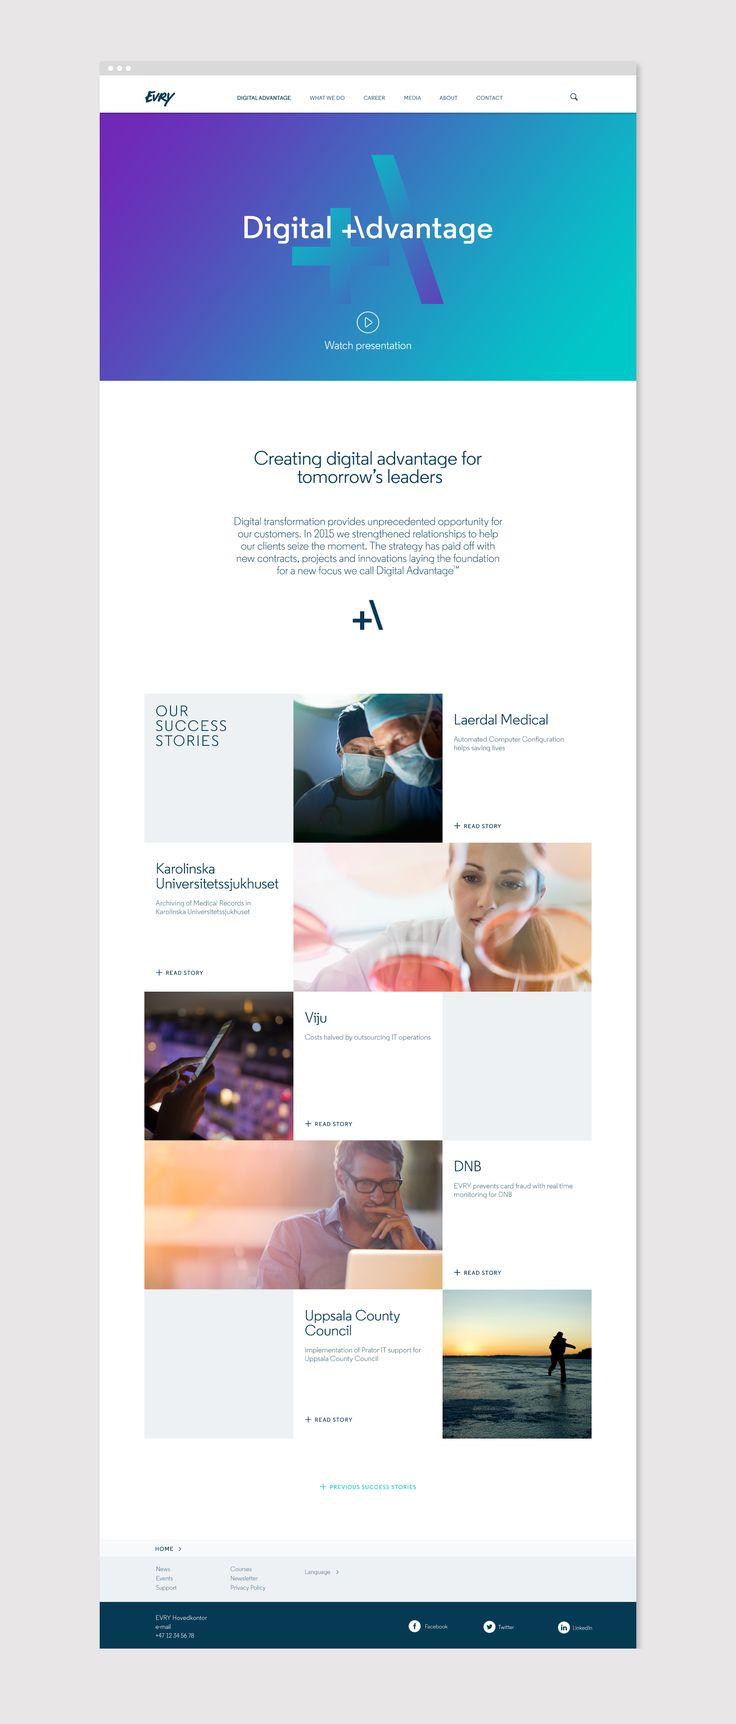 EVRY - Web designed by Mission